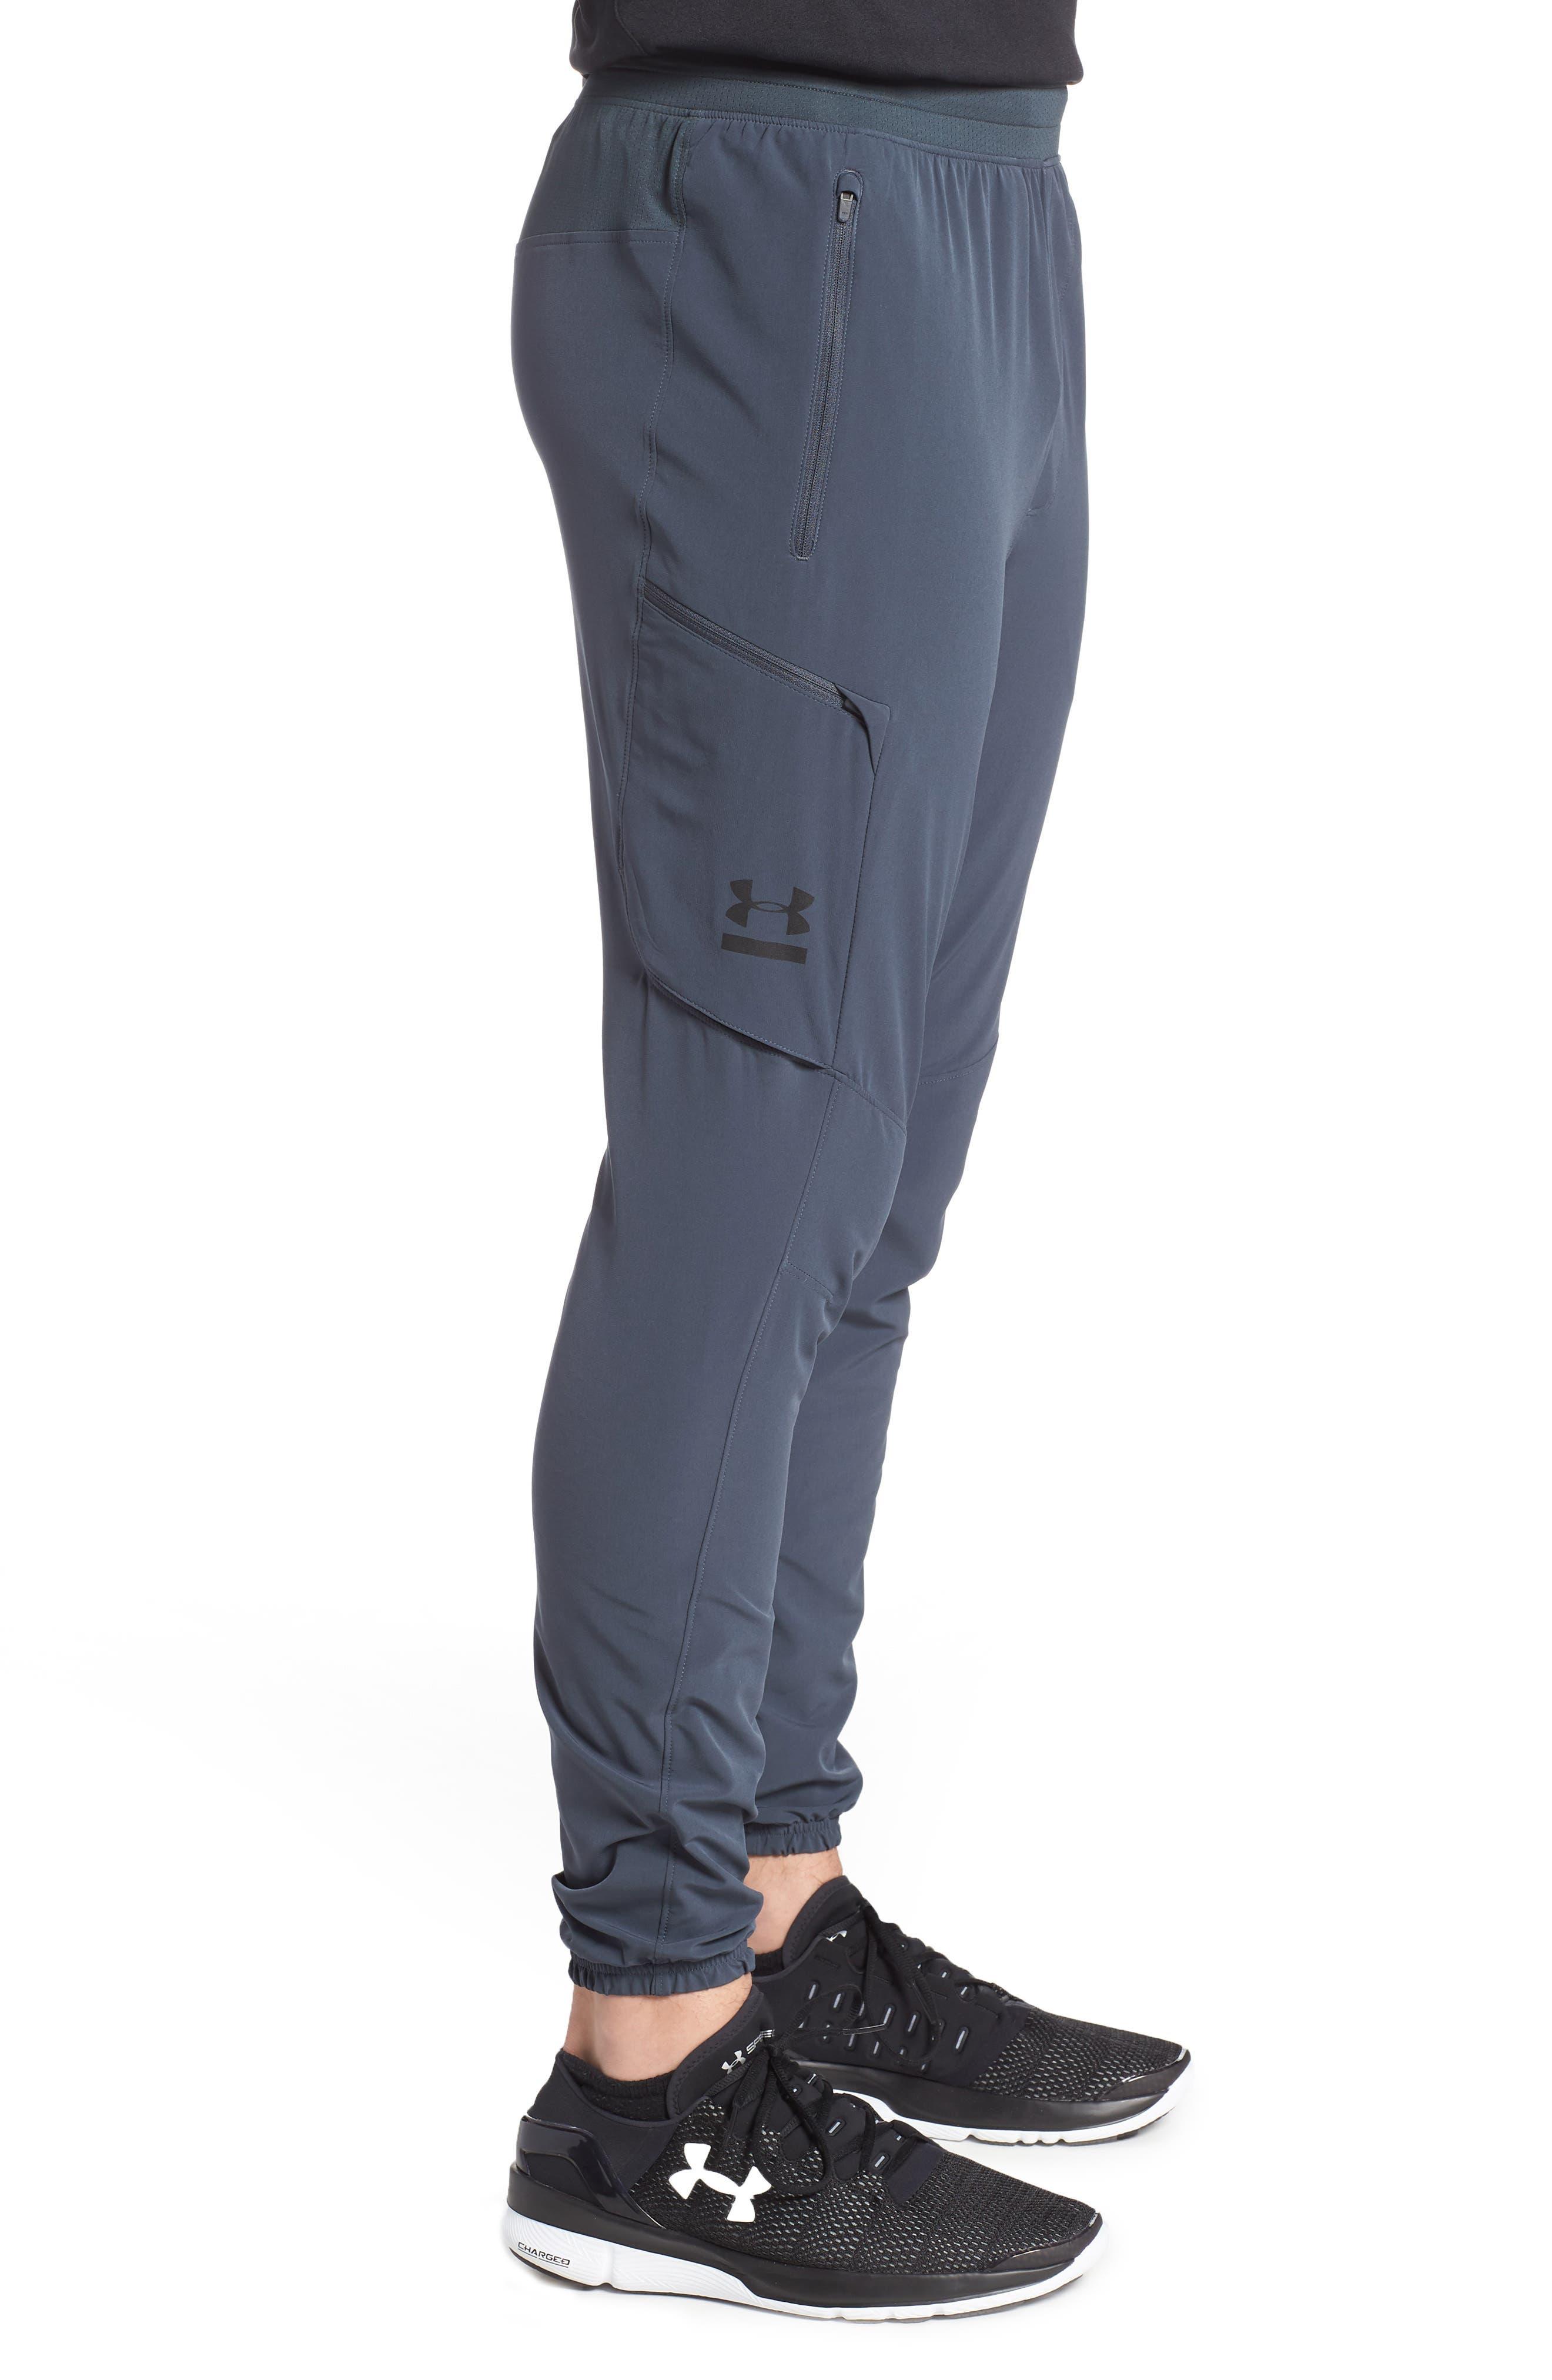 Perpetual Cargo Jogger Pants,                             Alternate thumbnail 3, color,                             Stealth Gray/ Black